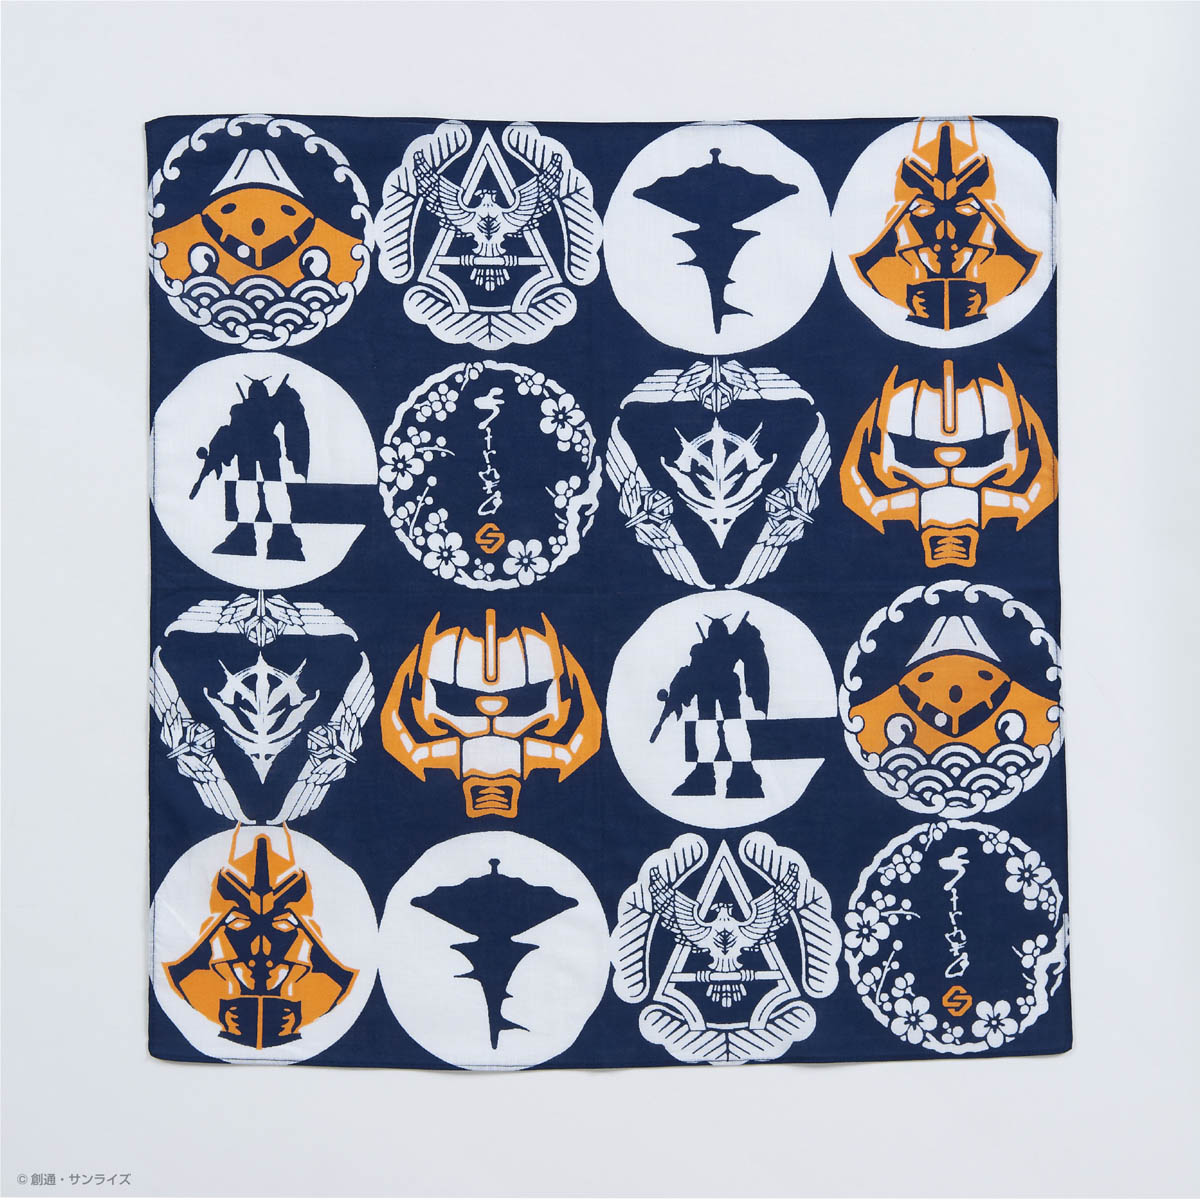 STRICT-G JAPAN 「機動戦士ガンダム」 ハンカチ 紋様柄